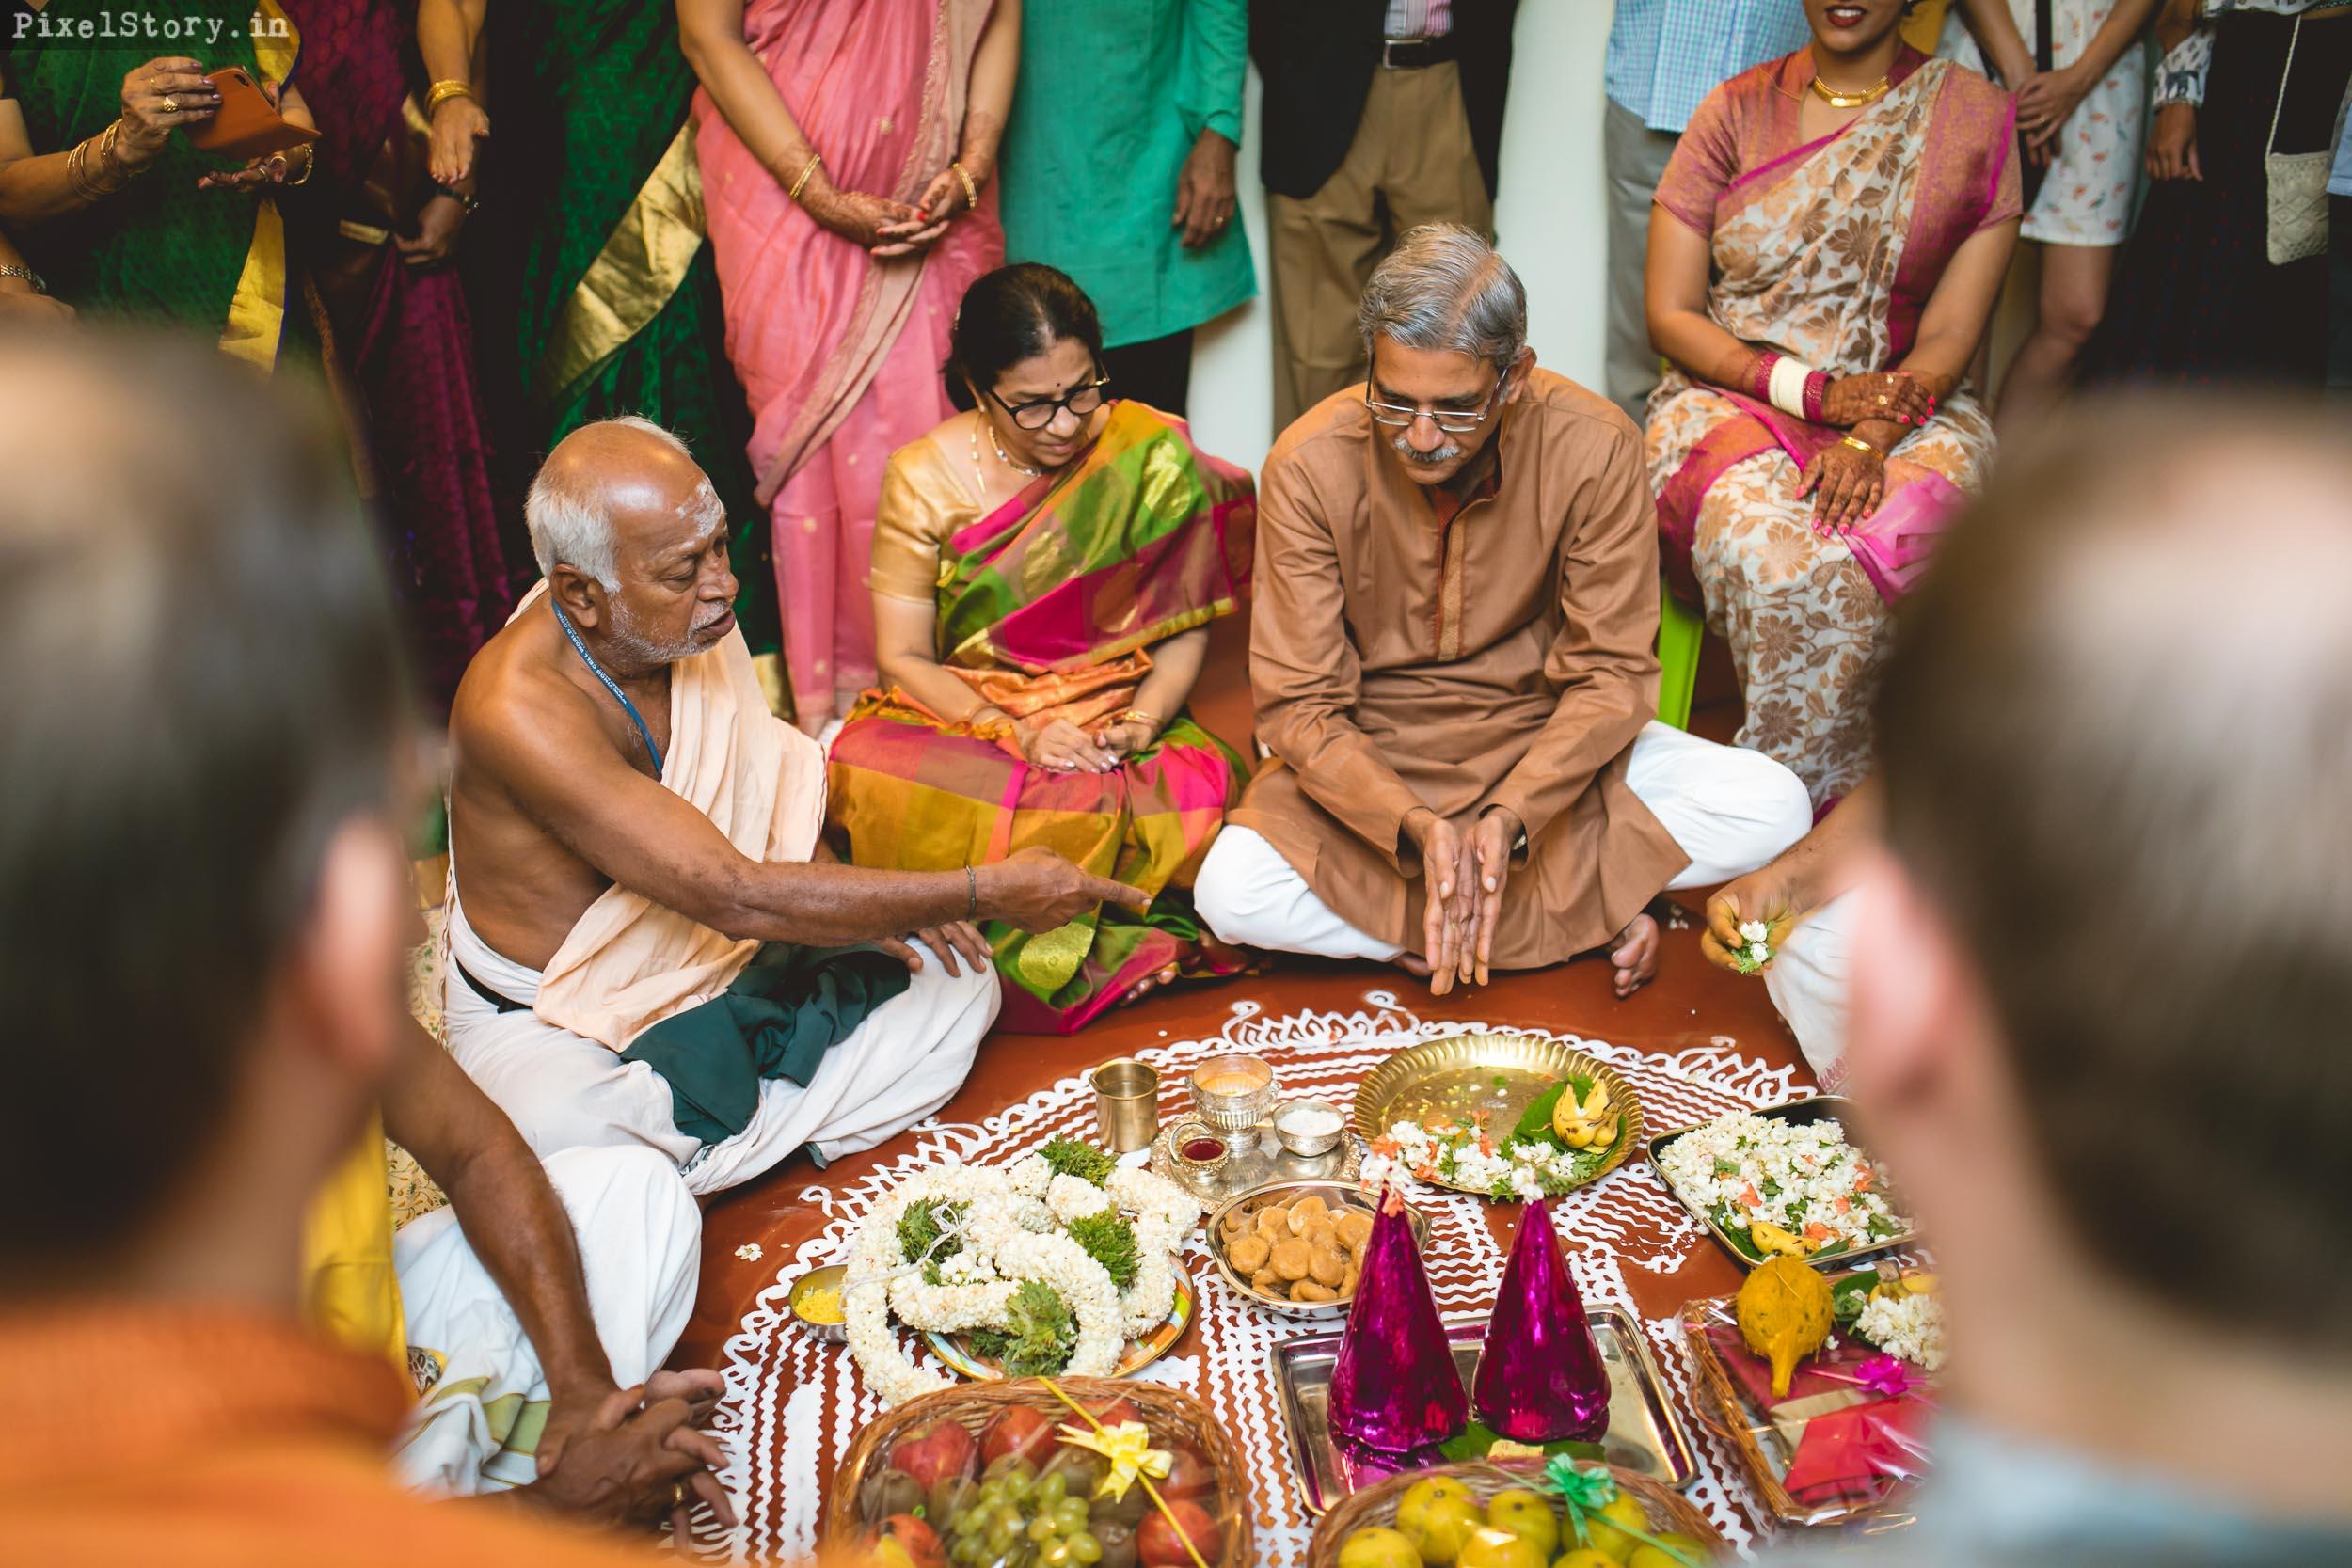 PixelStory-Jungle-Wedding-Photographer-Masinagudi-Indo-French004.jpg